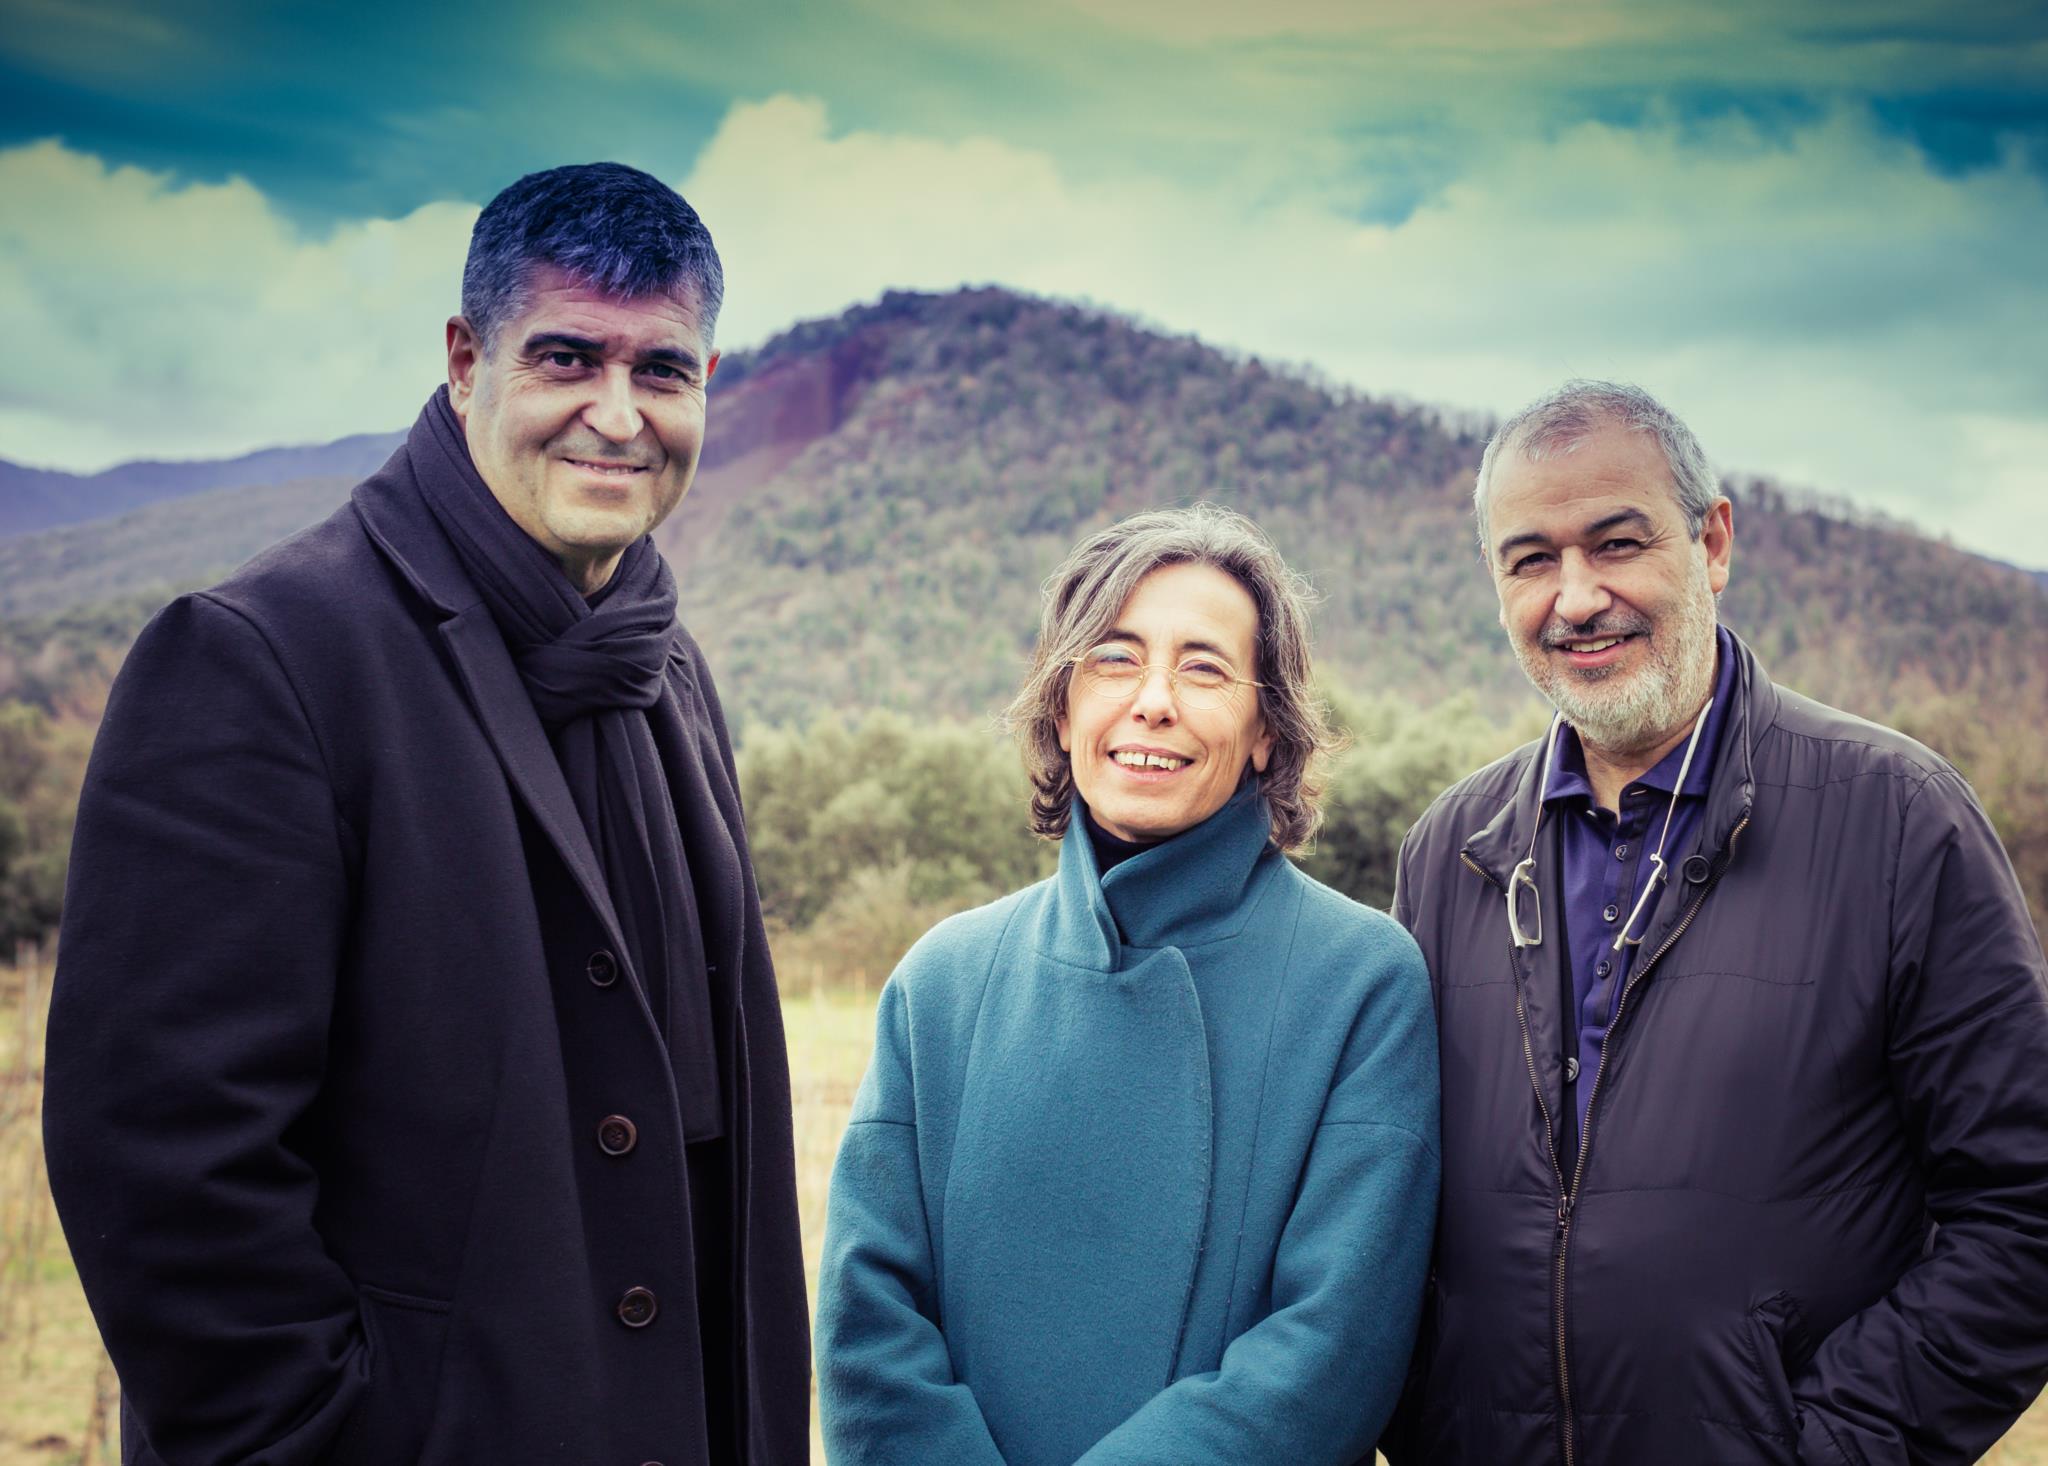 PÚBLICO - Prémio Pritzker distingue atelier catalão Olot RCR